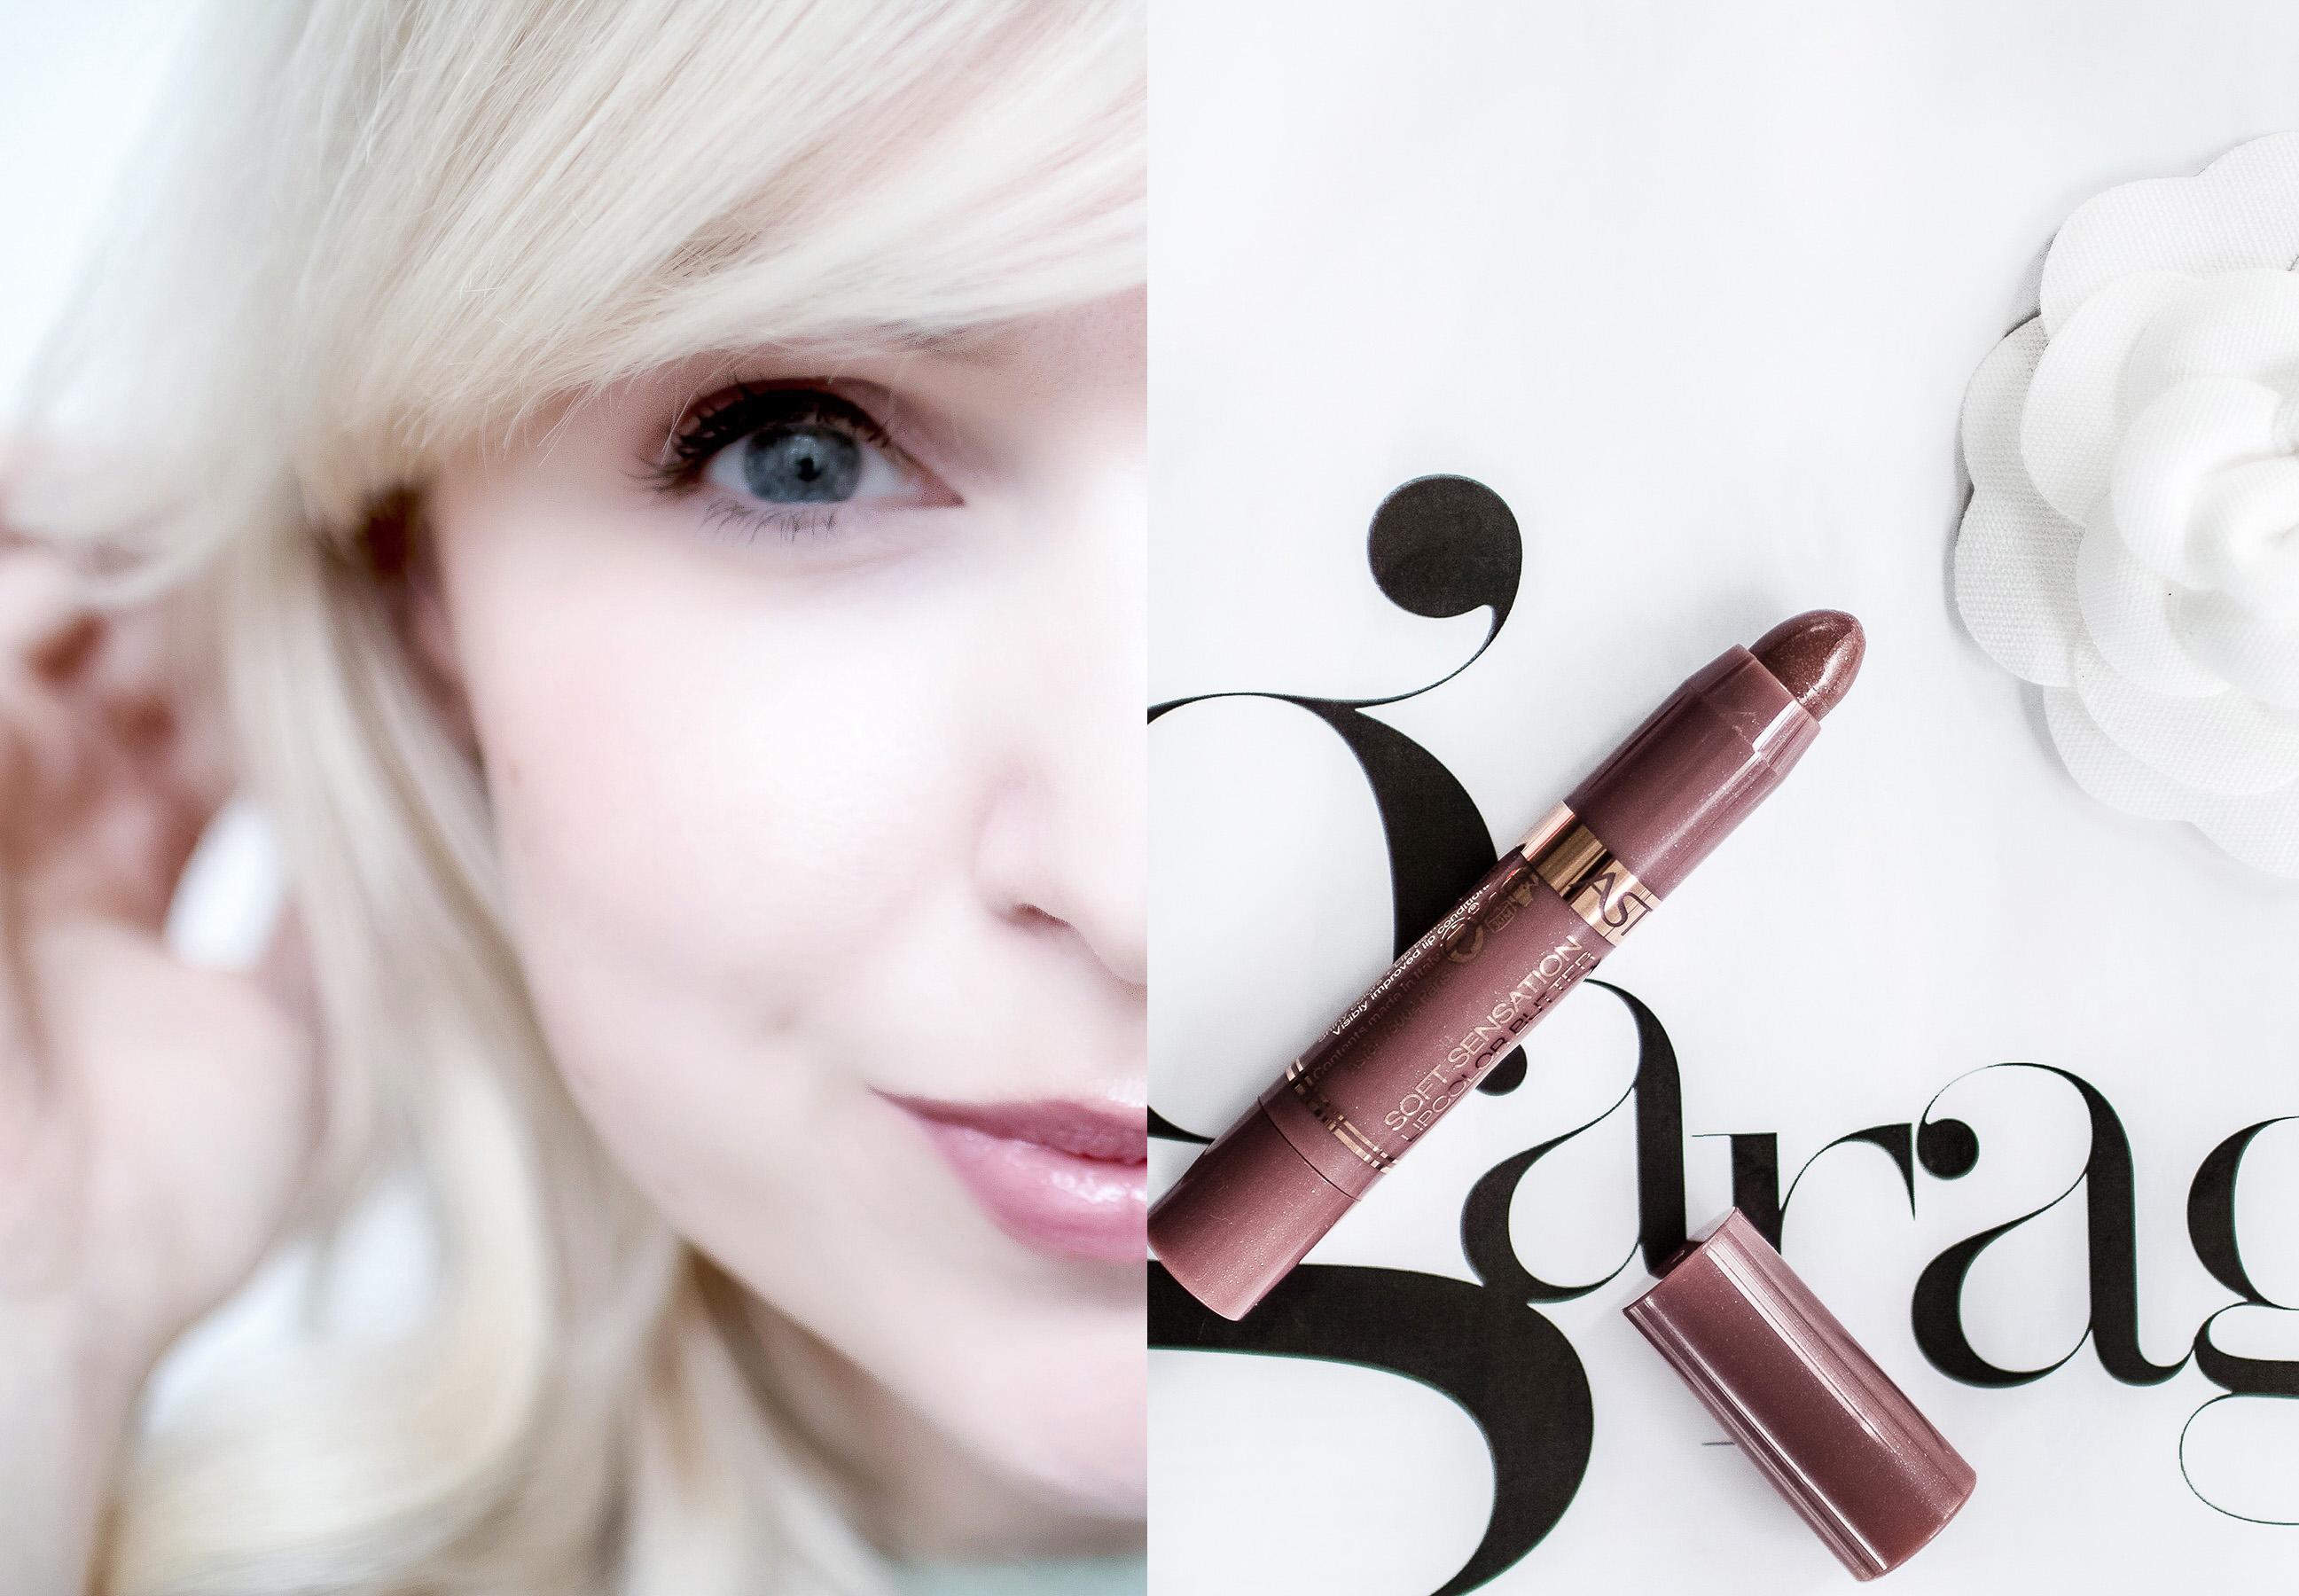 Astor_HeidiKlum_beautytrend_Pastell_zukkerme